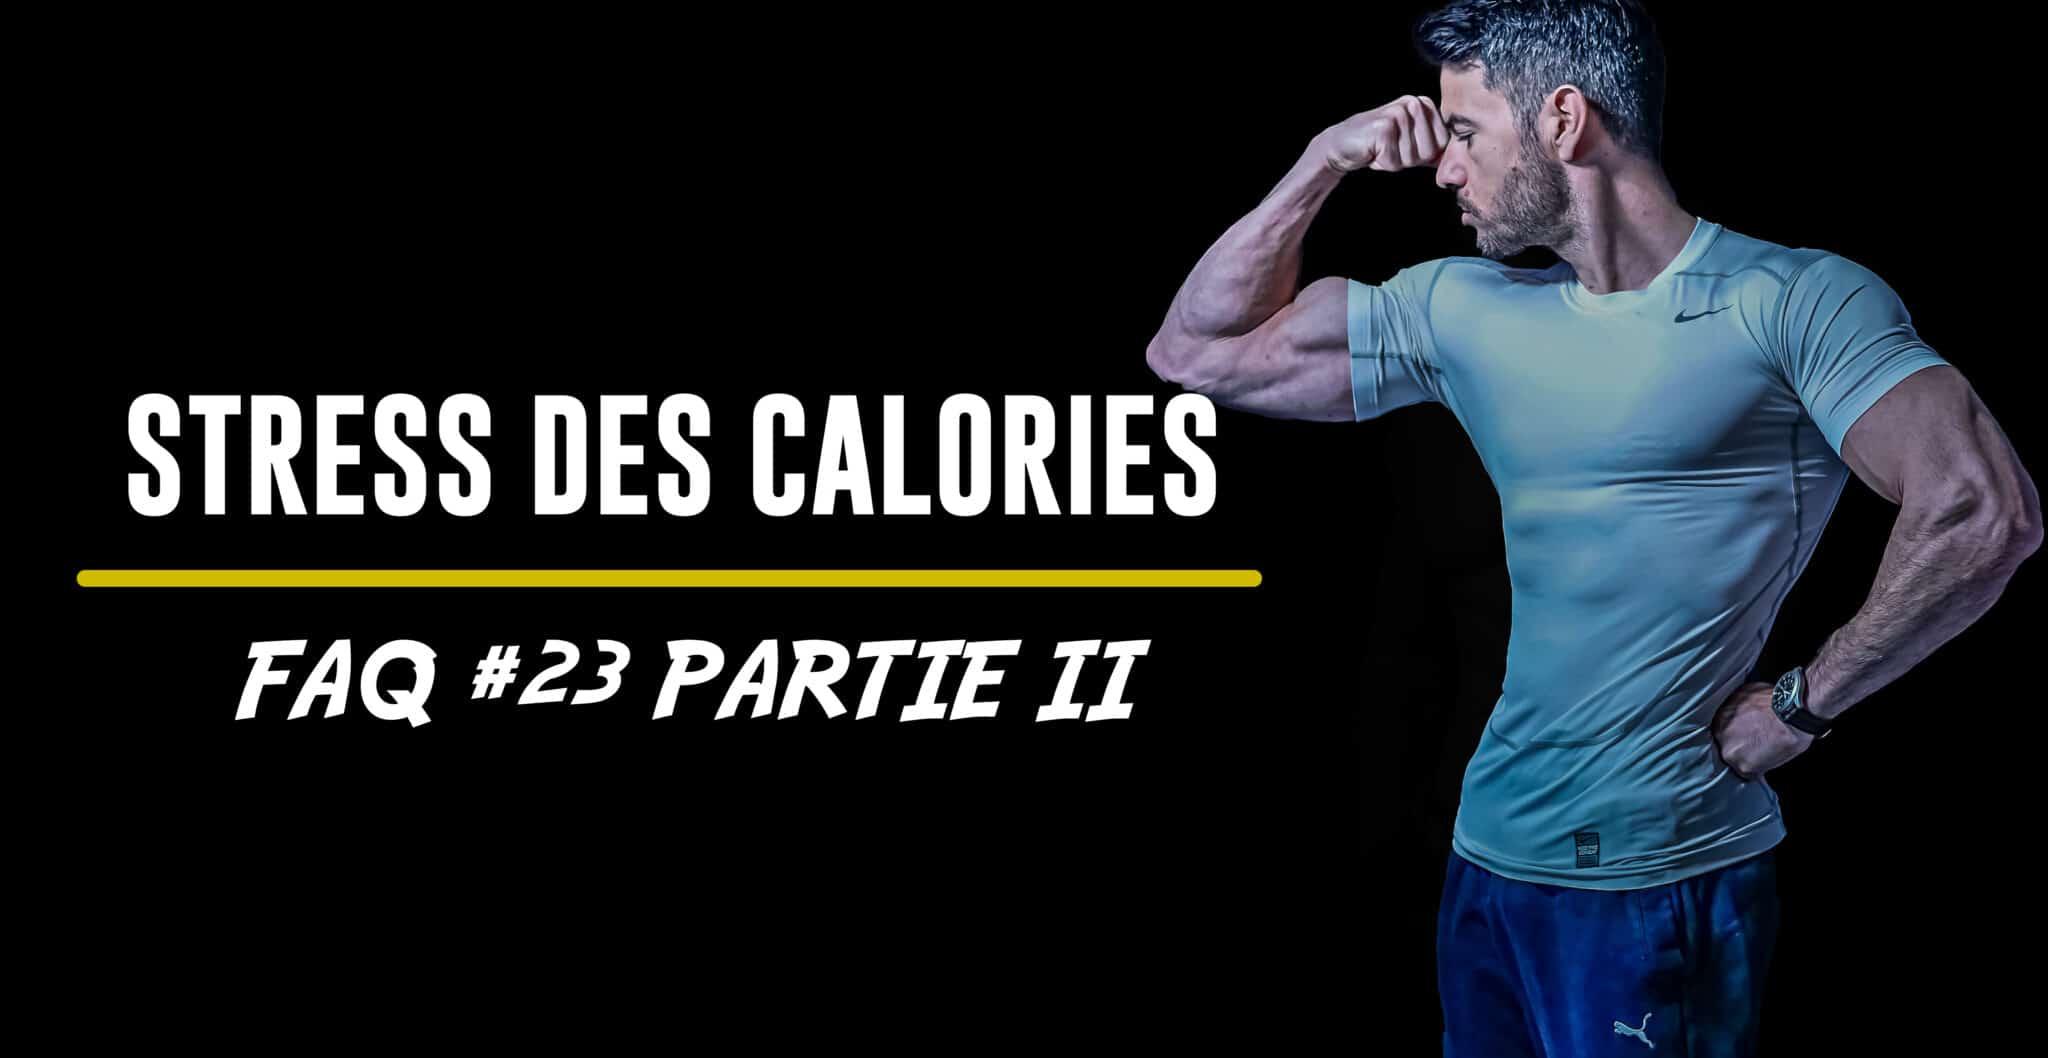 Compter mes calories me stress énormément FAQ 23 partie 2